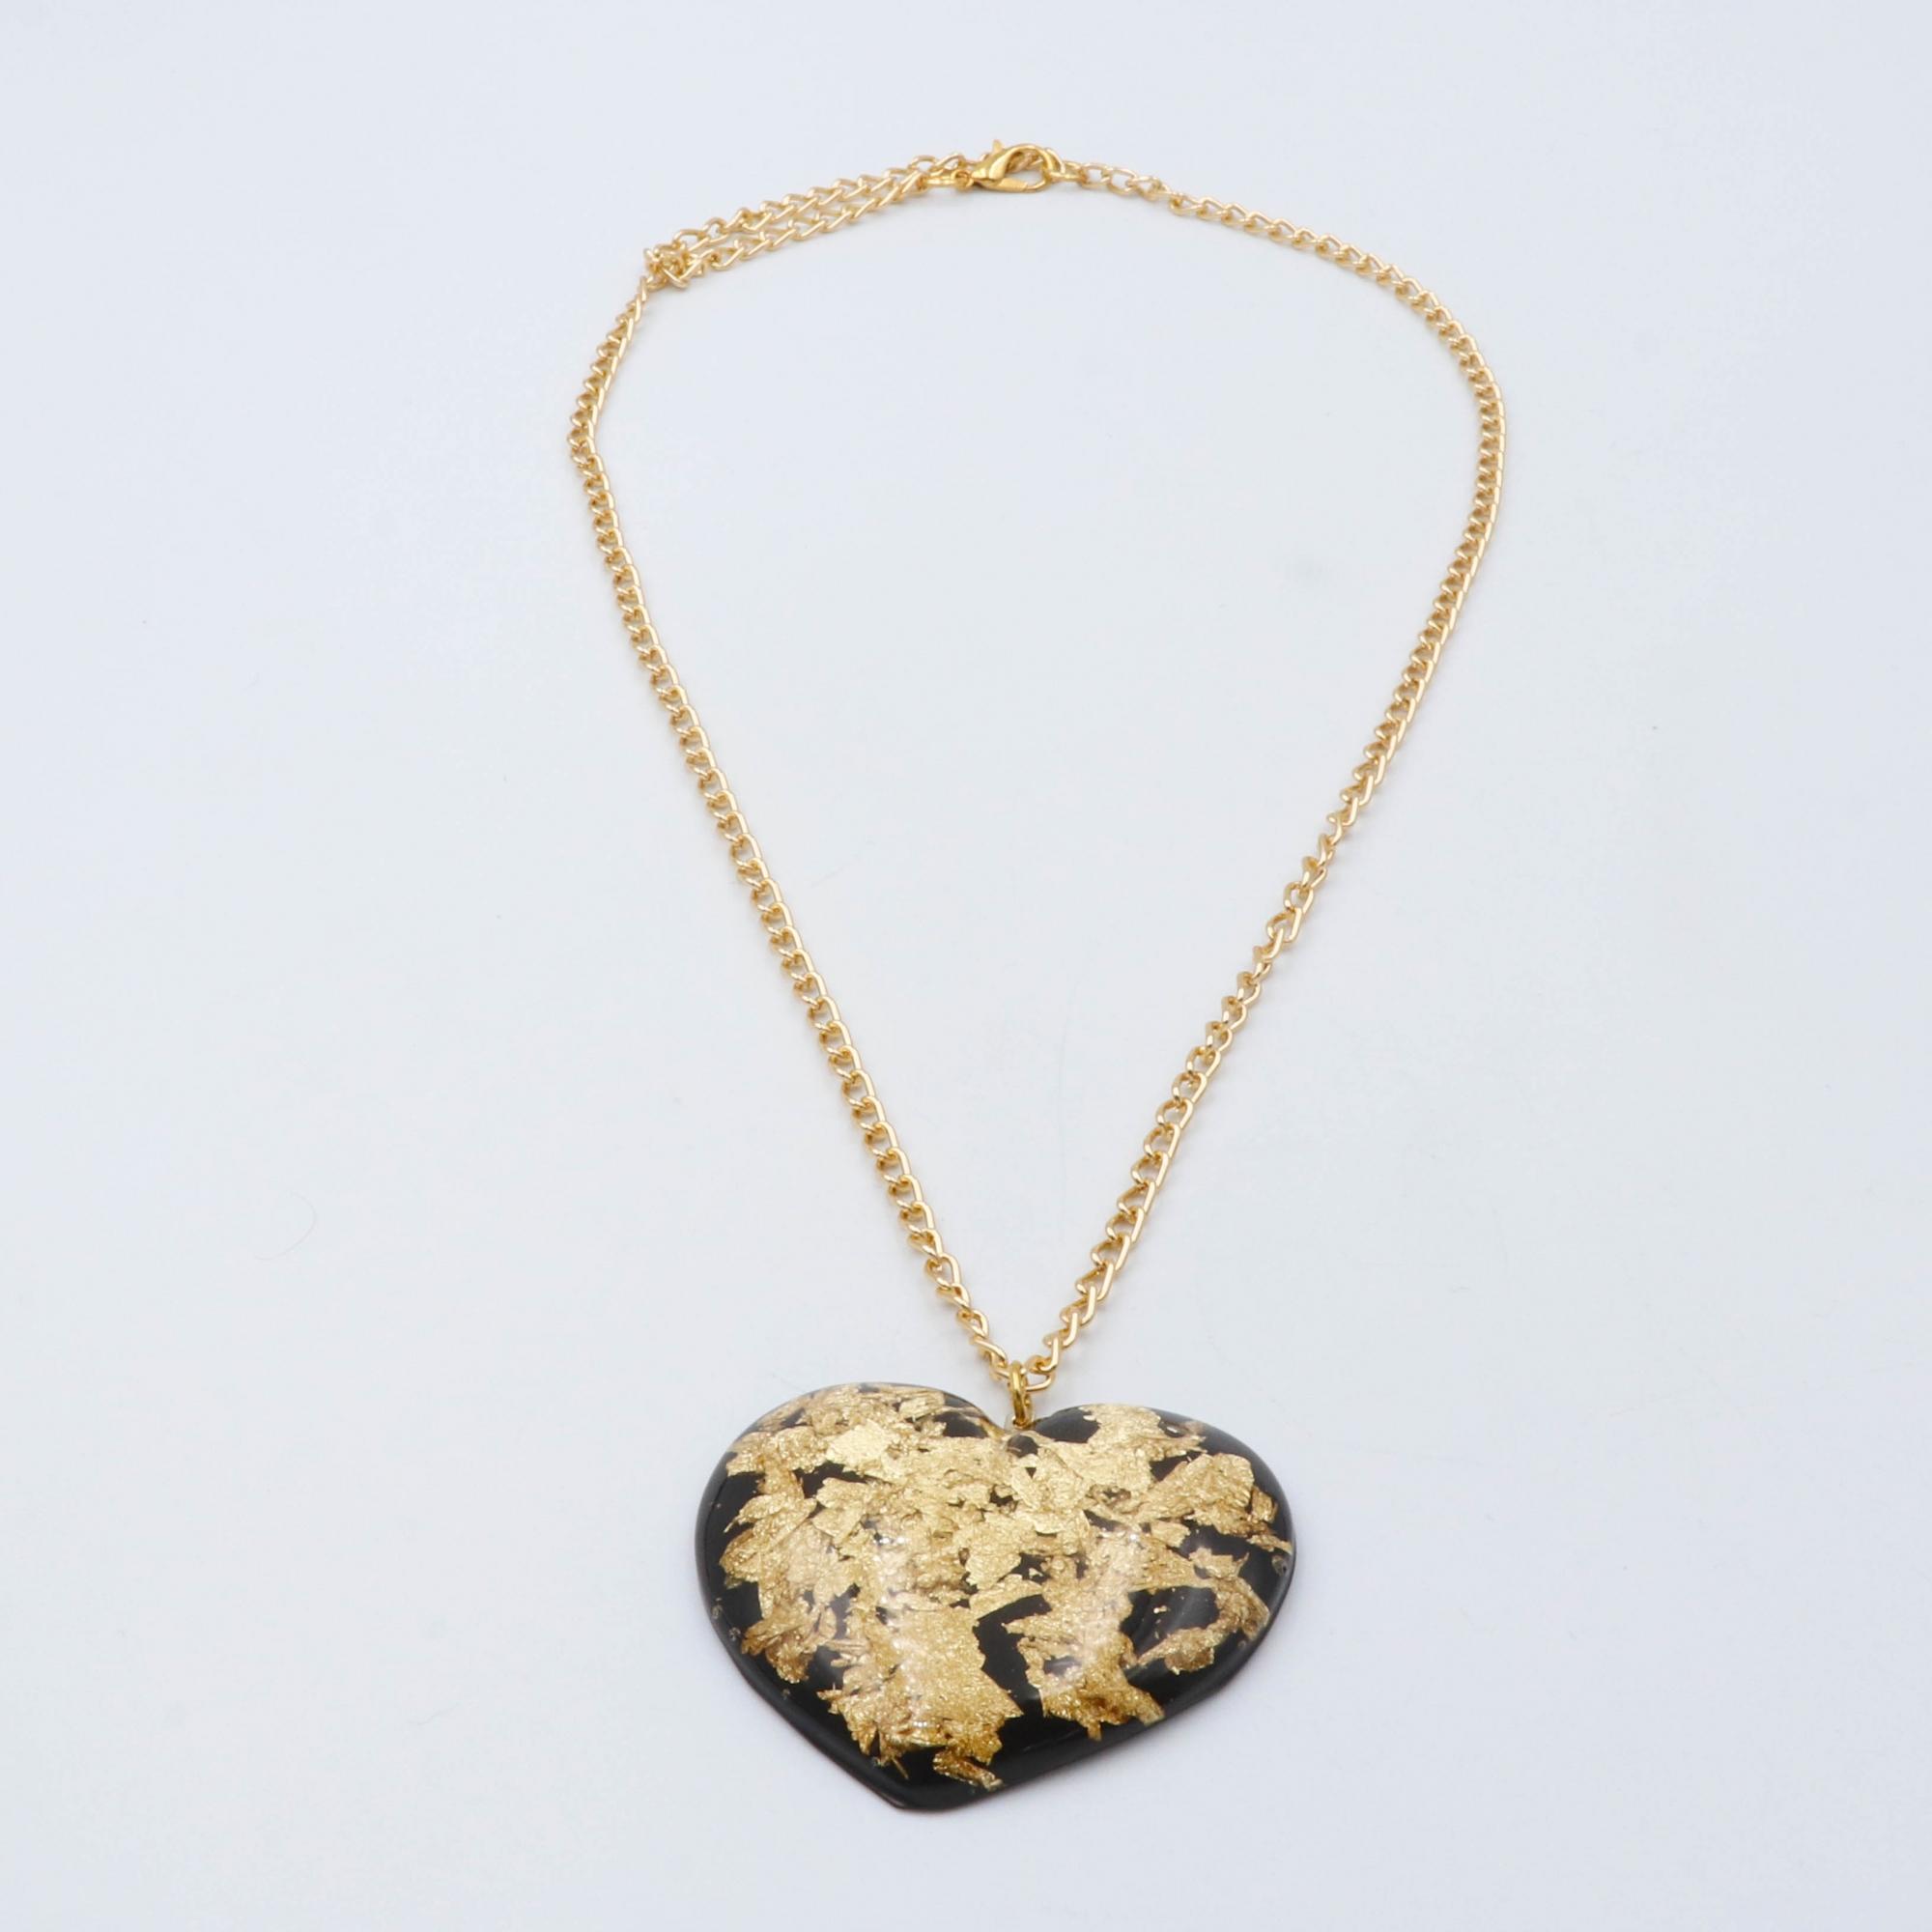 COLAR GOLDEN HEART - PRETO